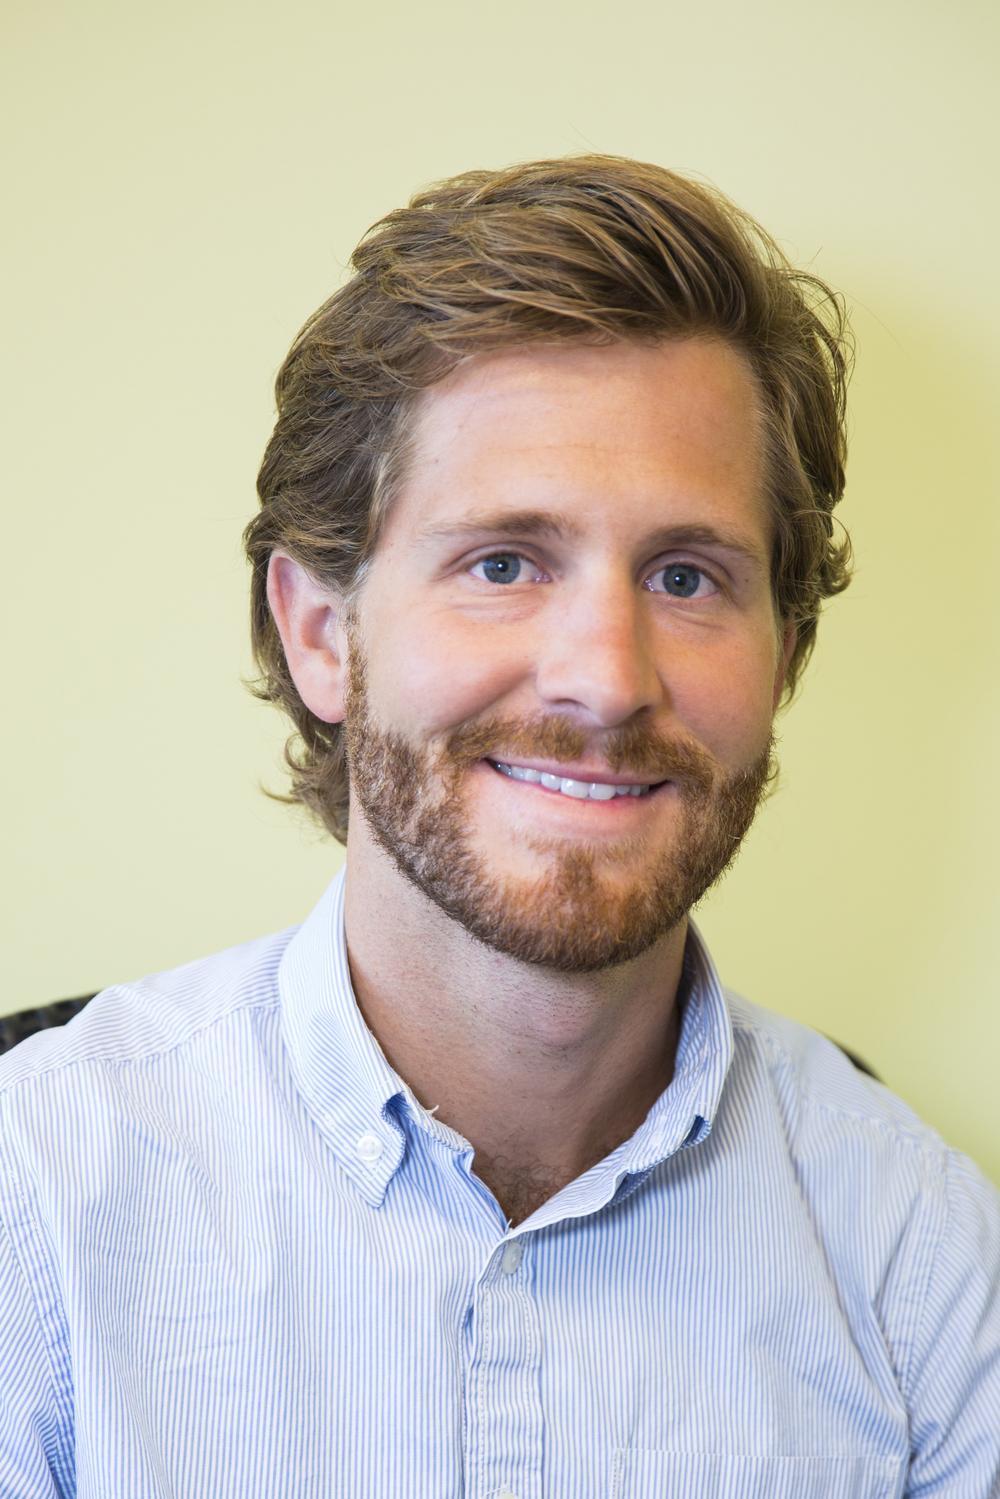 Nicholas Rajewski Account Manager Read Full Bio >